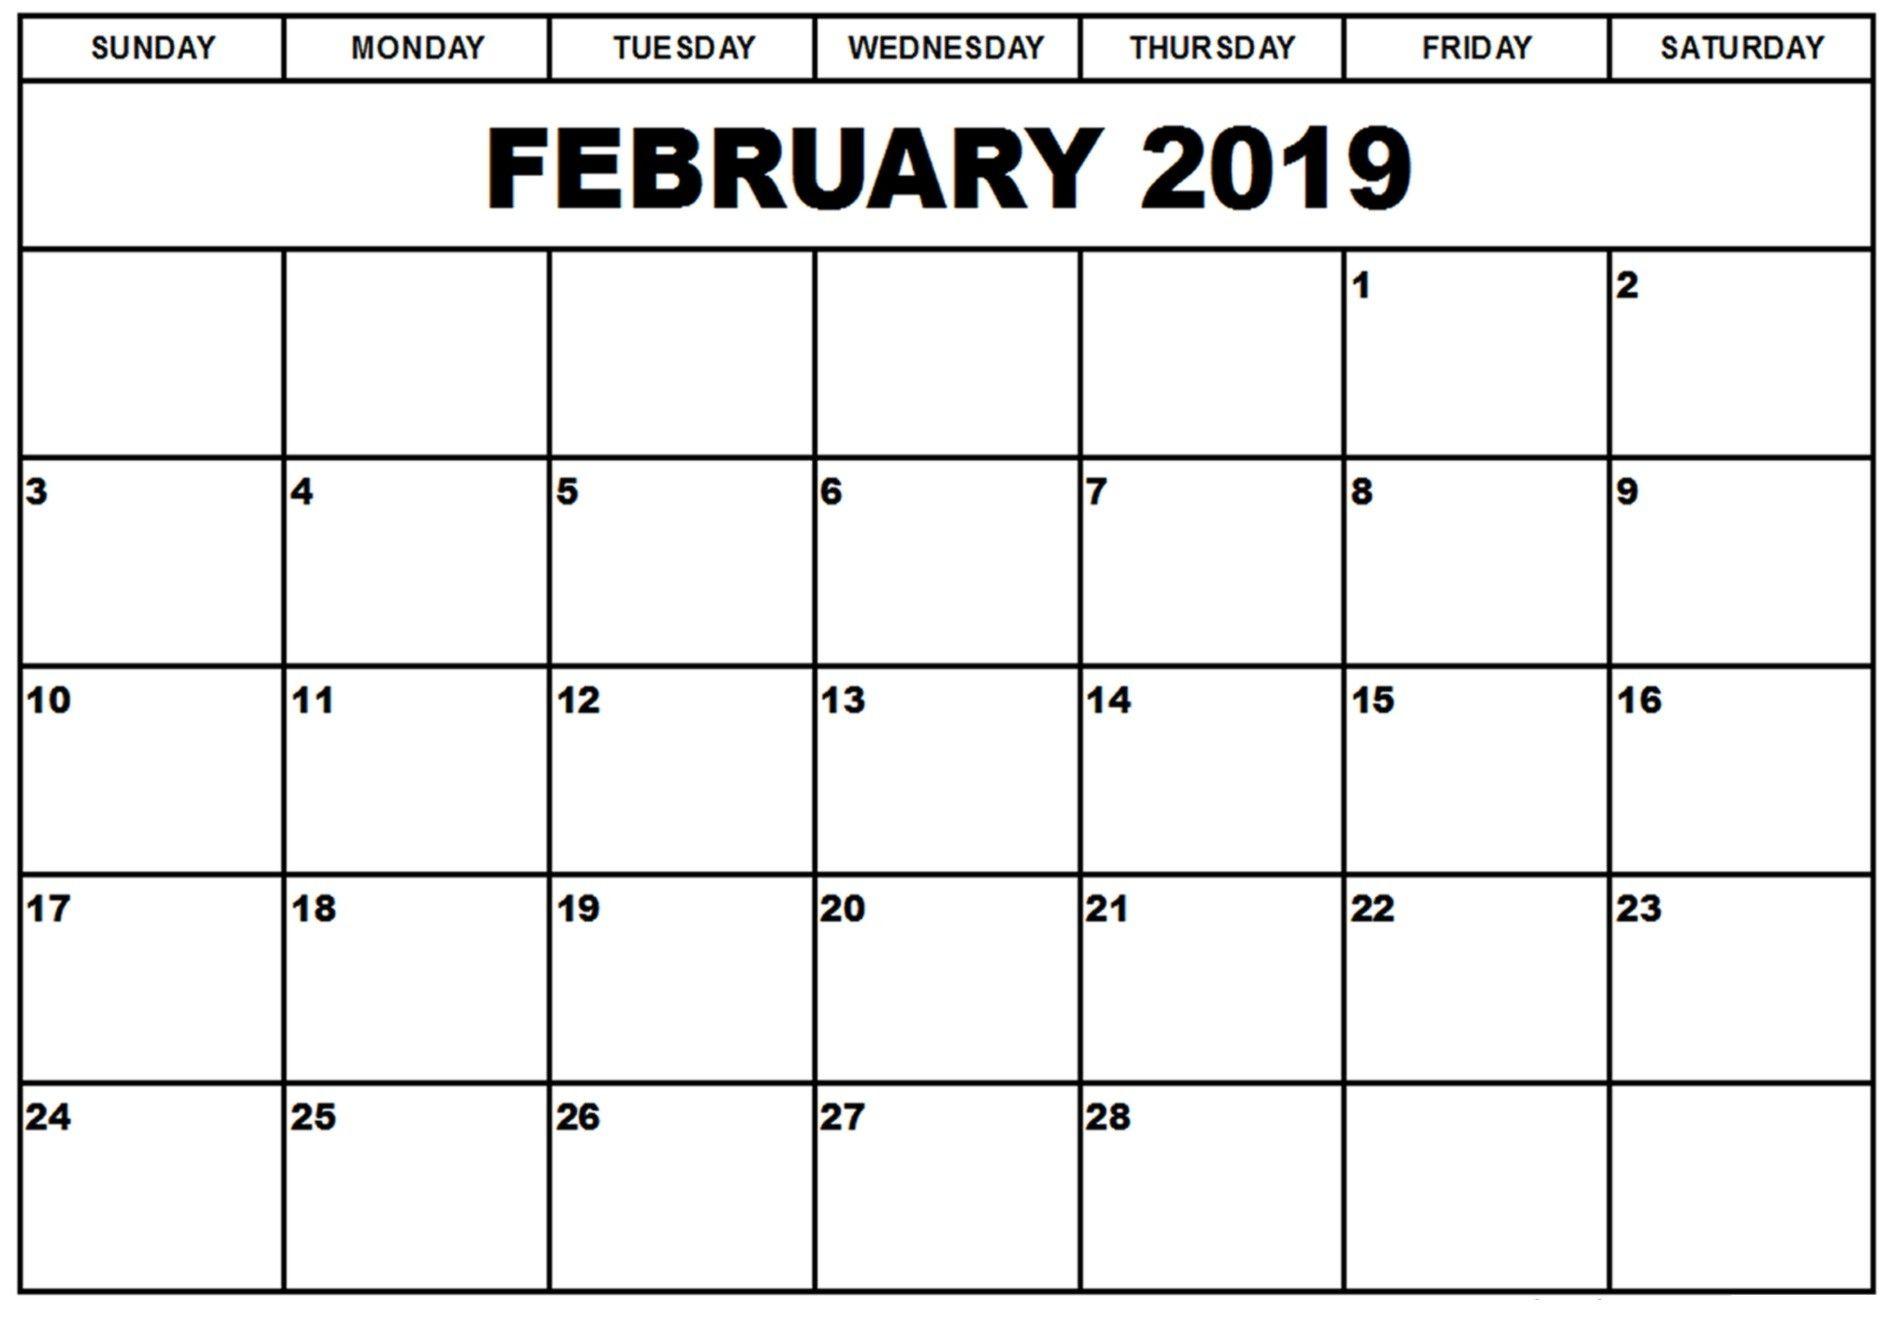 Printable Calendars Save February 2019 Calendar Printable Templates inside Free Fillable Blank Calendar Templates